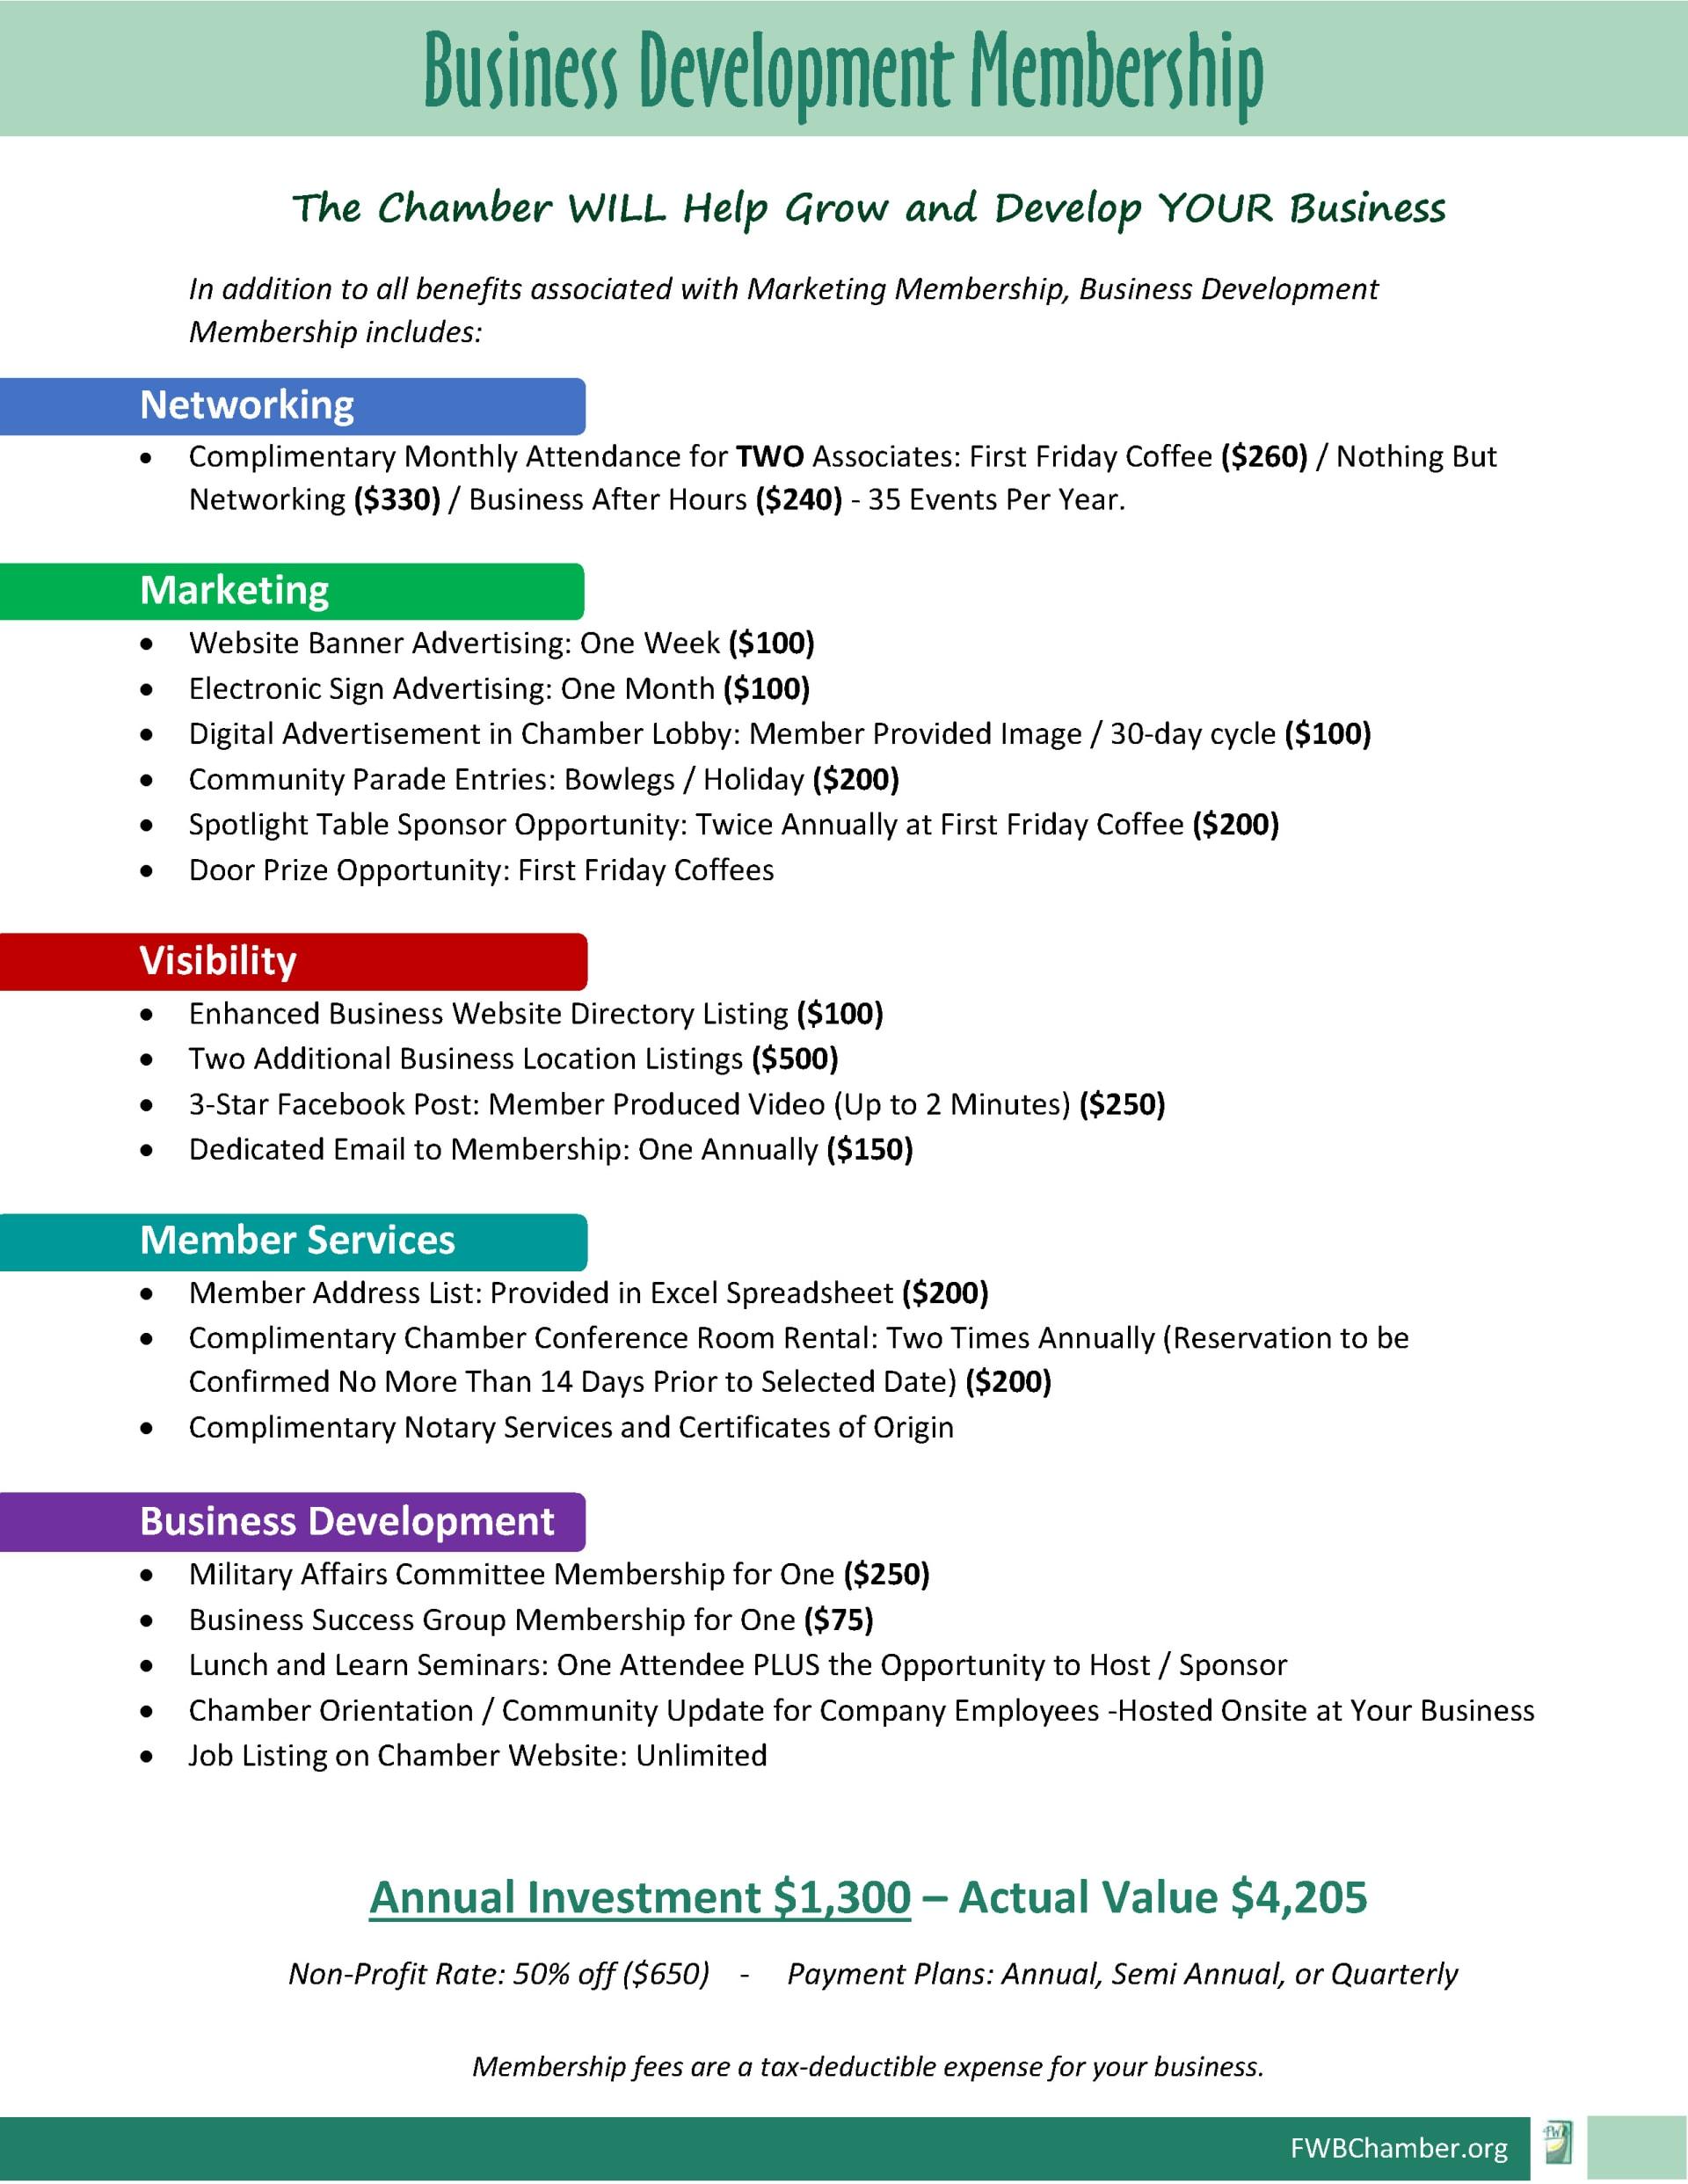 Tier-Dues-Brochure-7-28-2021_Page_05-w1920.jpg